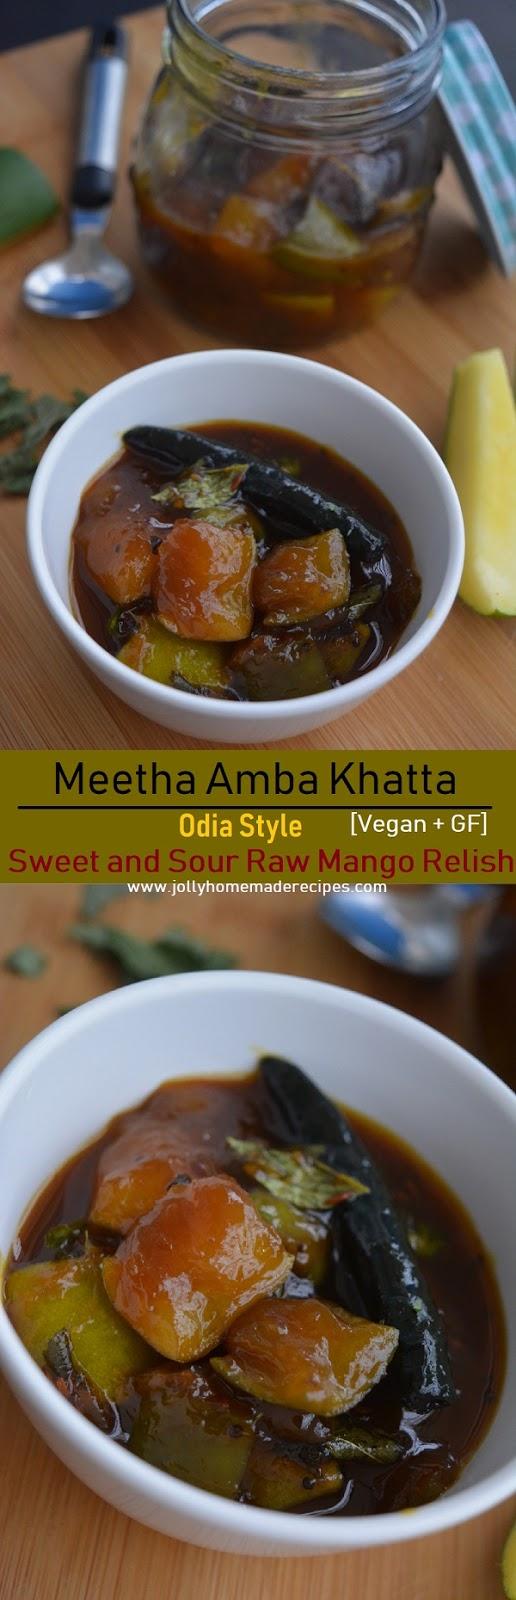 Odia style Meetha Aamba Khatta_Pinterest